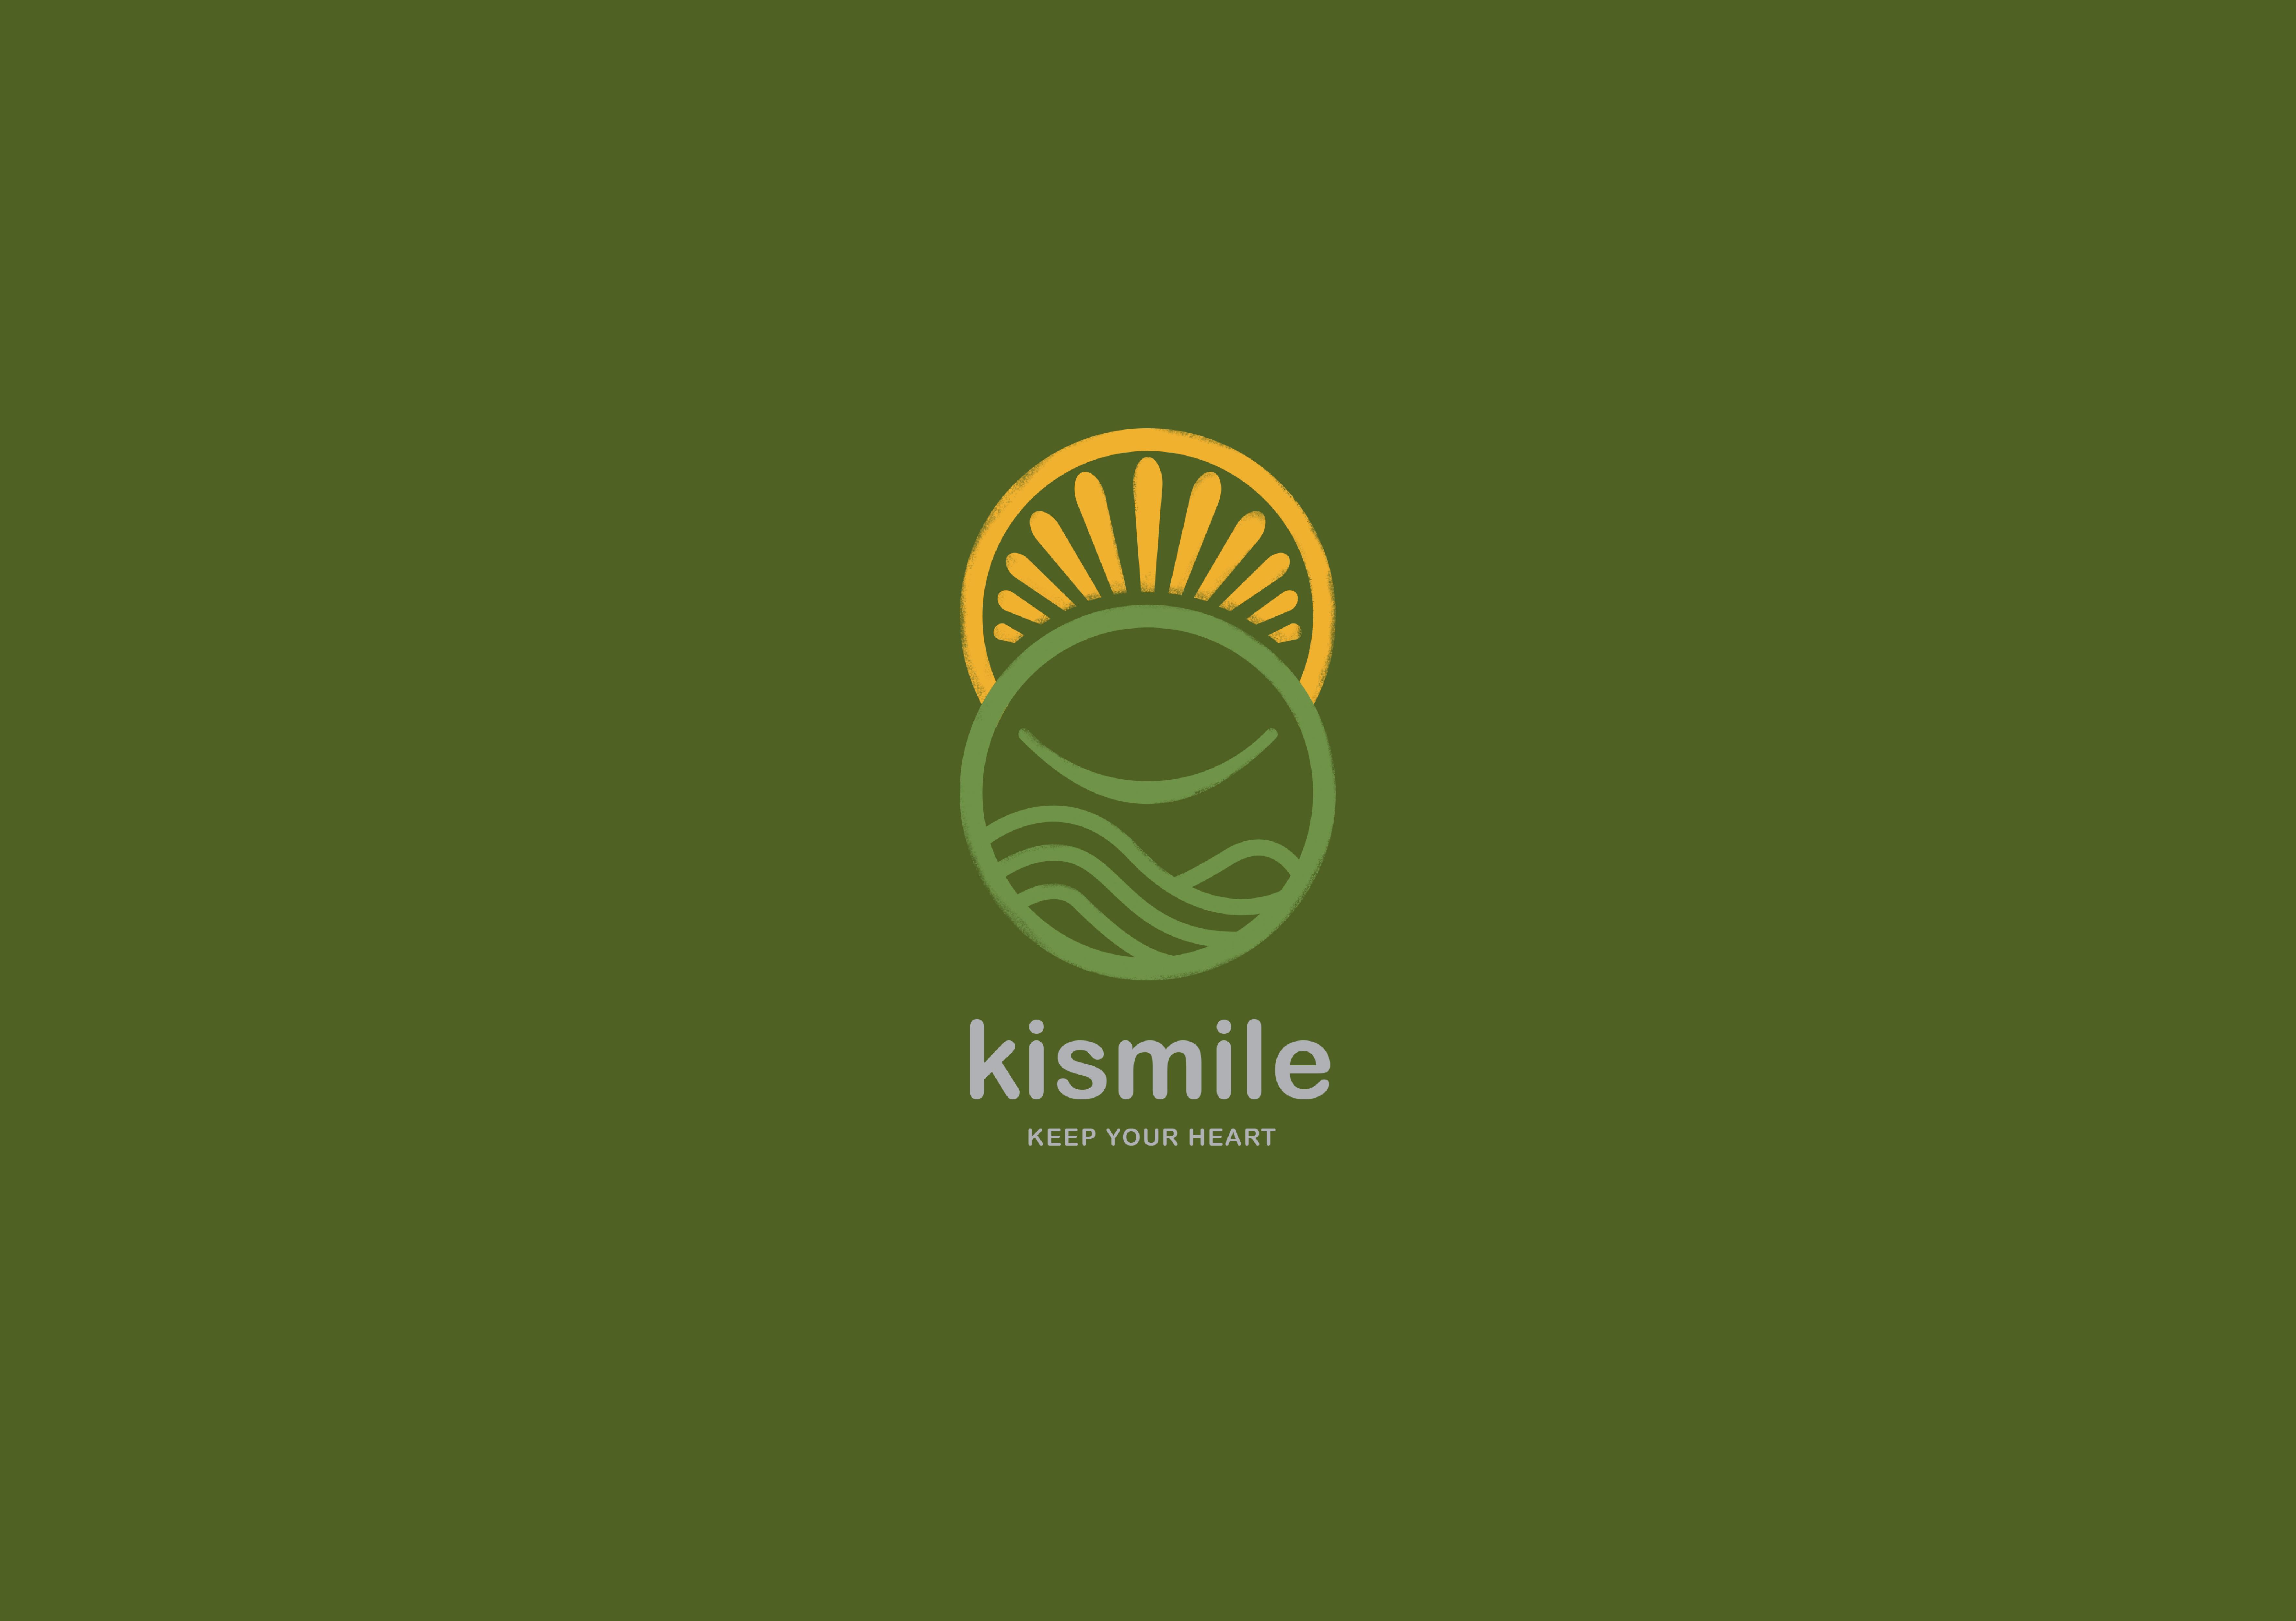 Kismile - Taiwan Kiwifruit